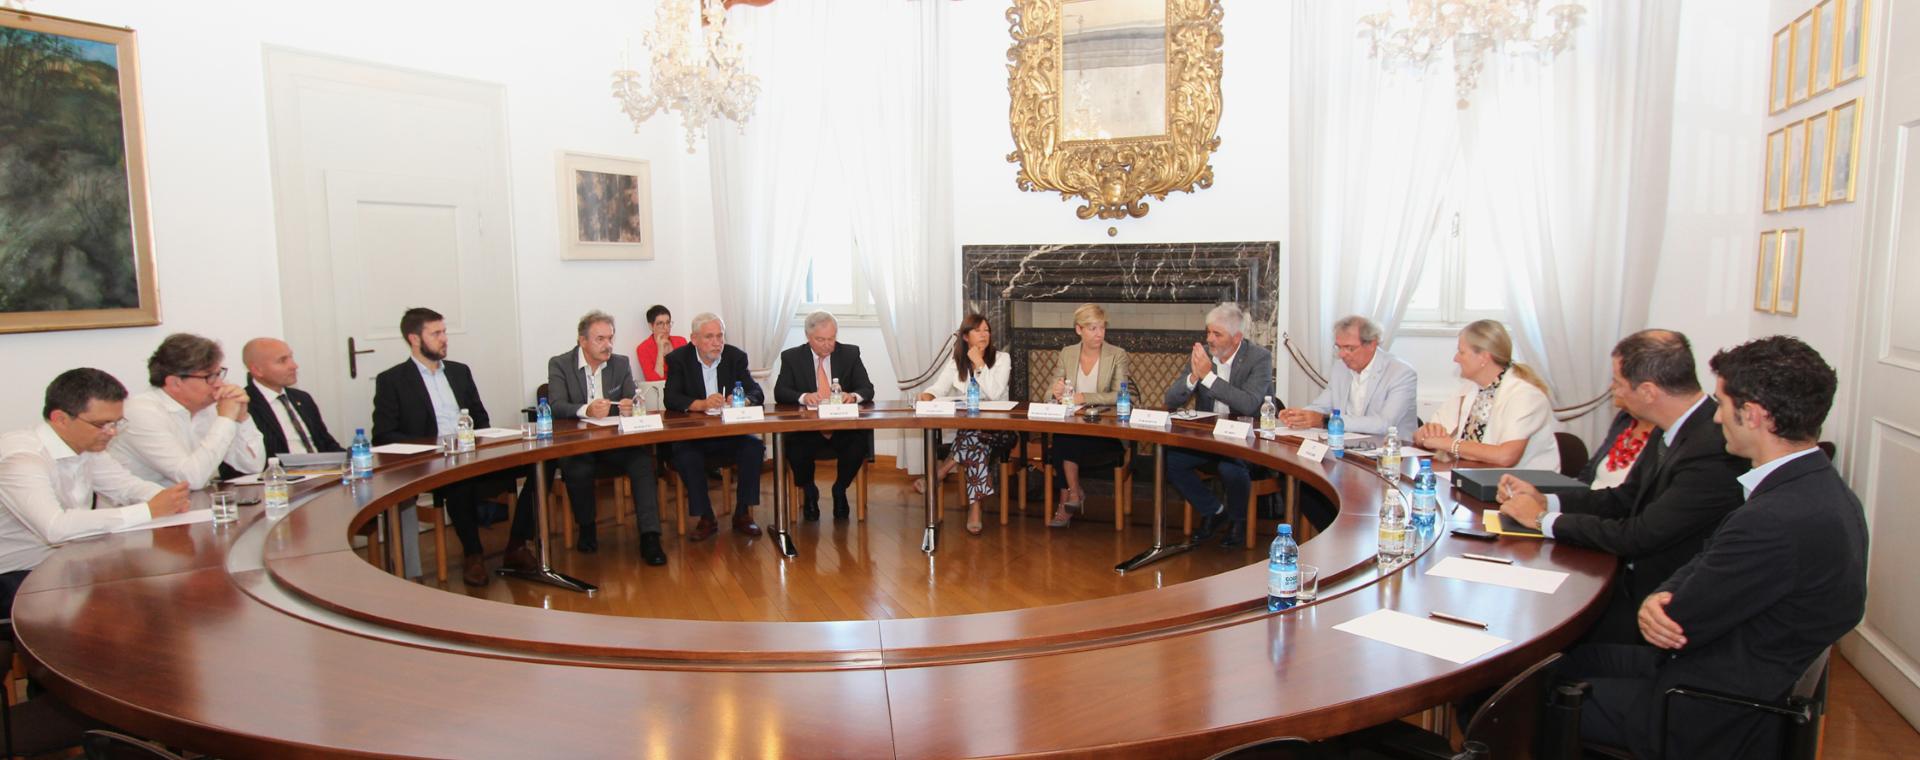 IP4FVG: il Digital Innovation Hub 'DIH Udine' diventa realtà